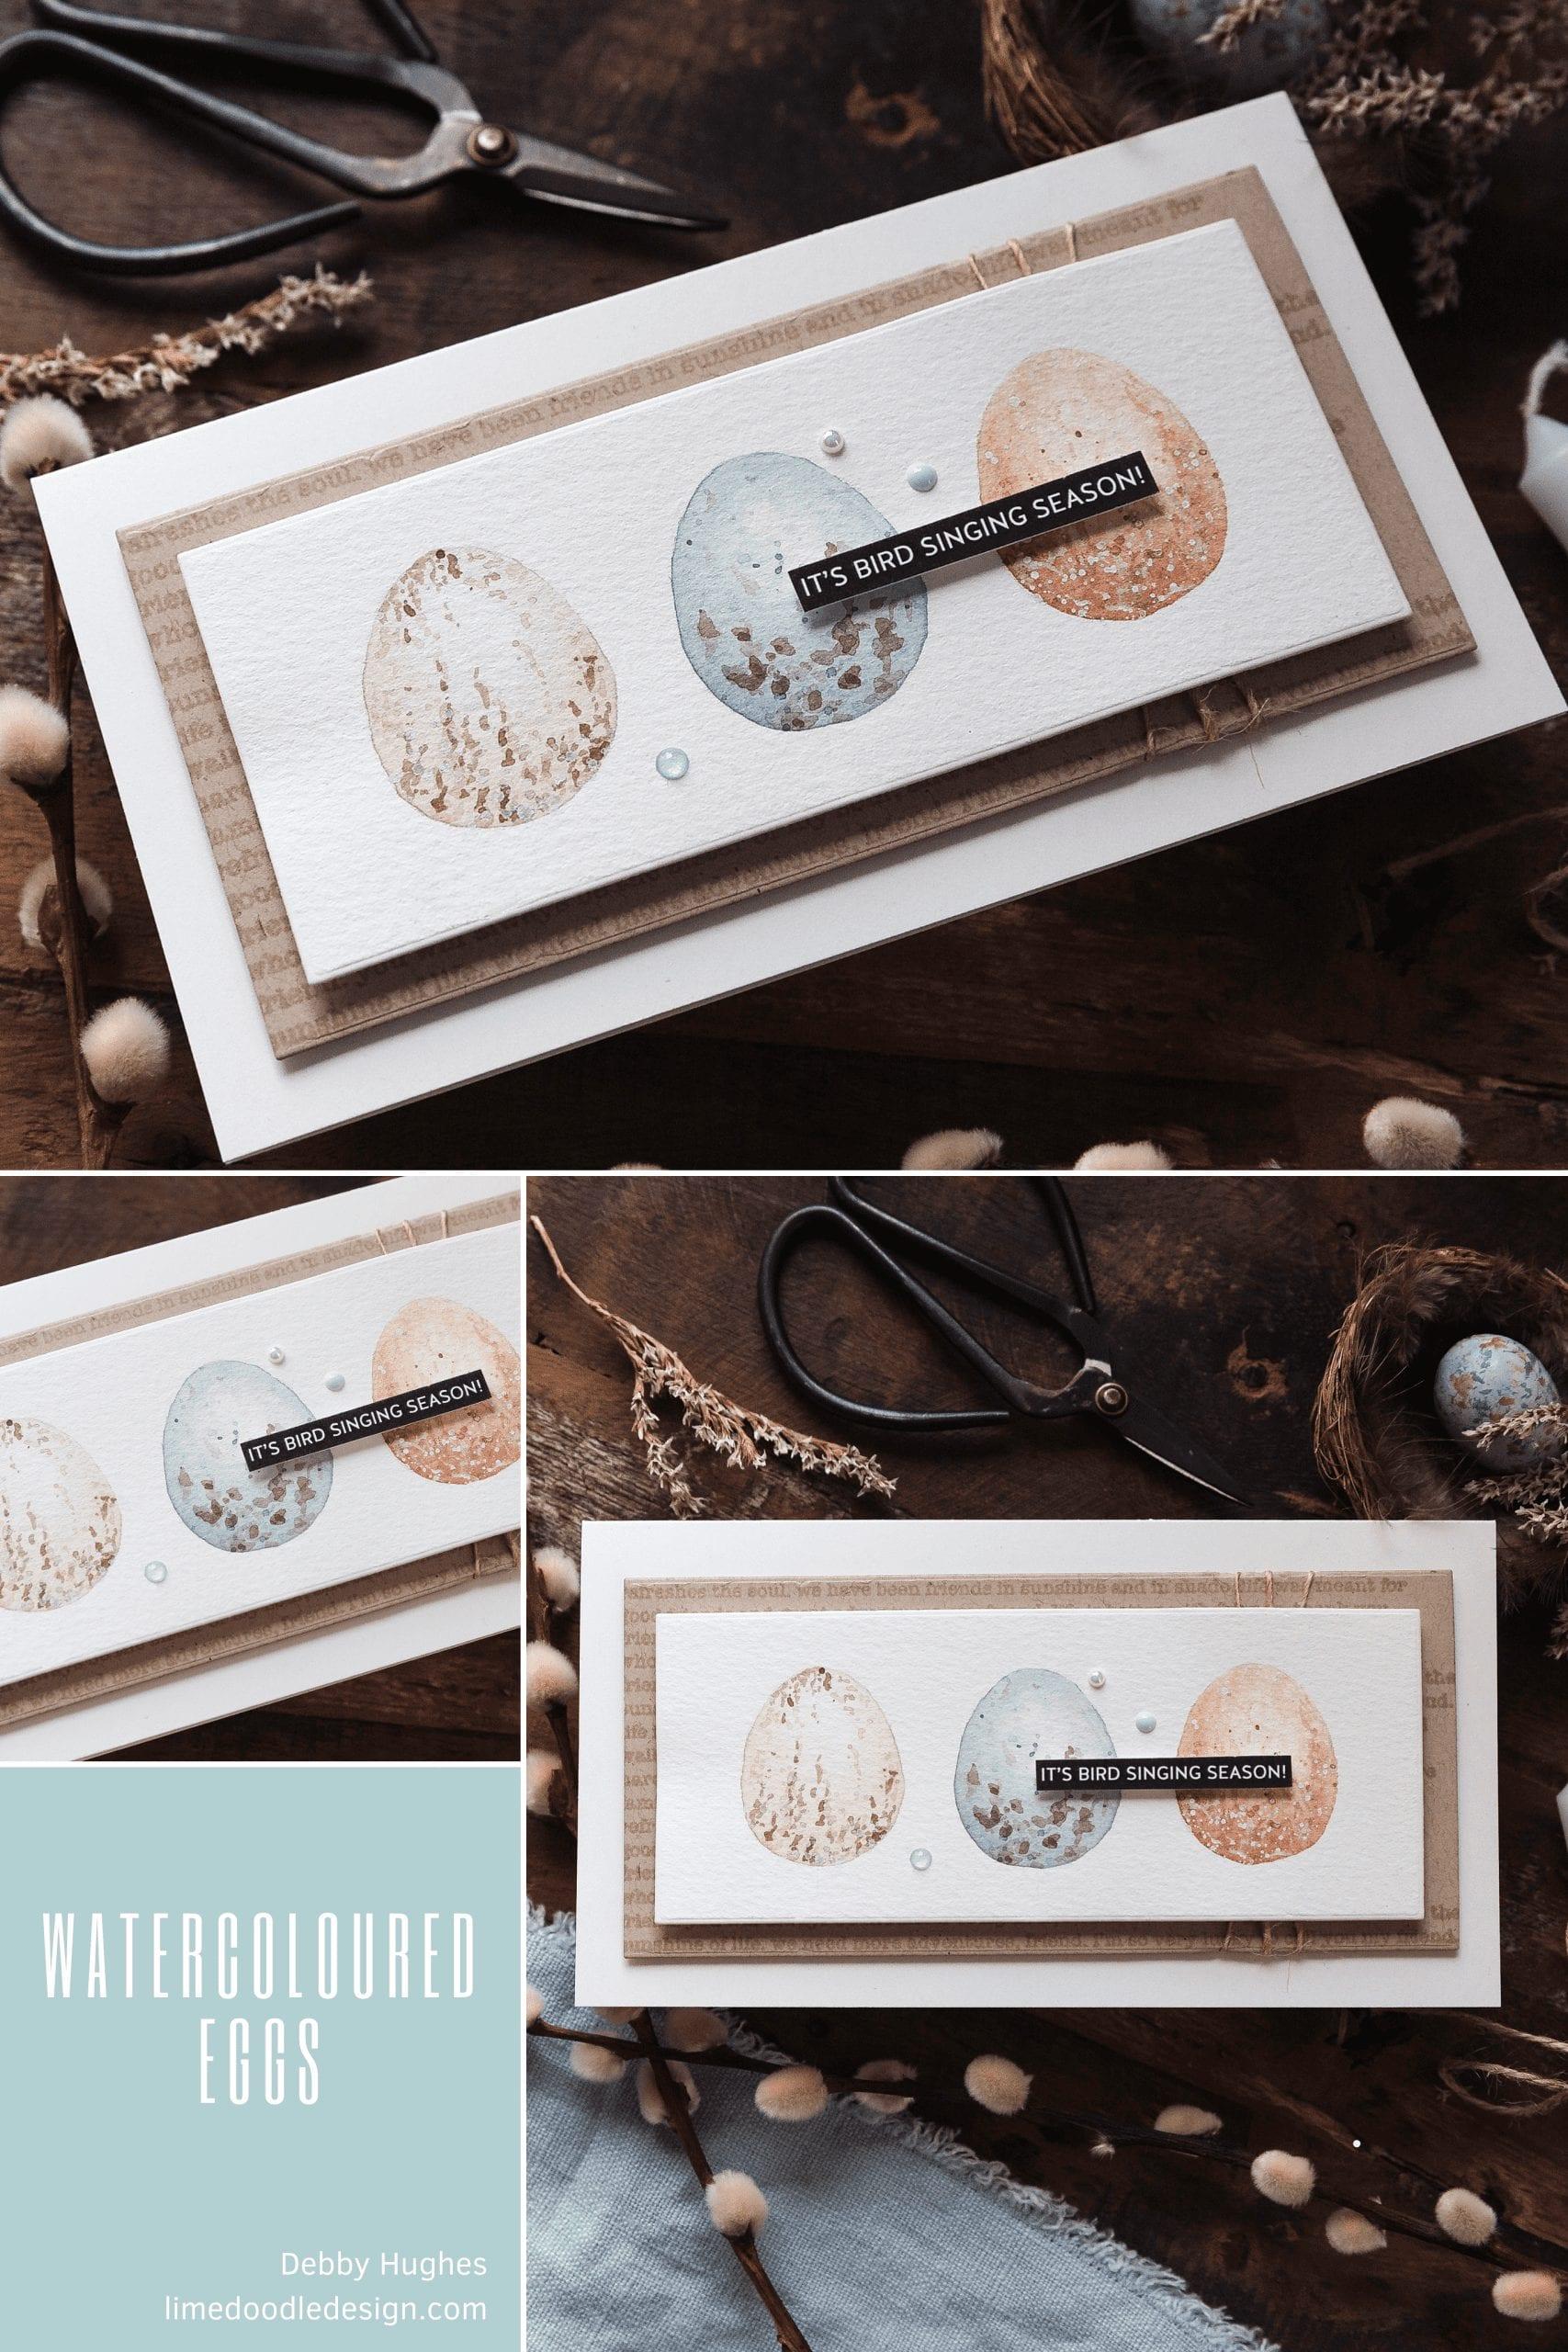 Video tutorial - watercoloured spring eggs. Handmade card by Debby Hughes #debbyhughes #limedoodledesign #handmadecards #cardmaking #cardmakingideas #cardmakingtechniques  #cardmakingtutorials #handmadecardideas #simonsaysstamp